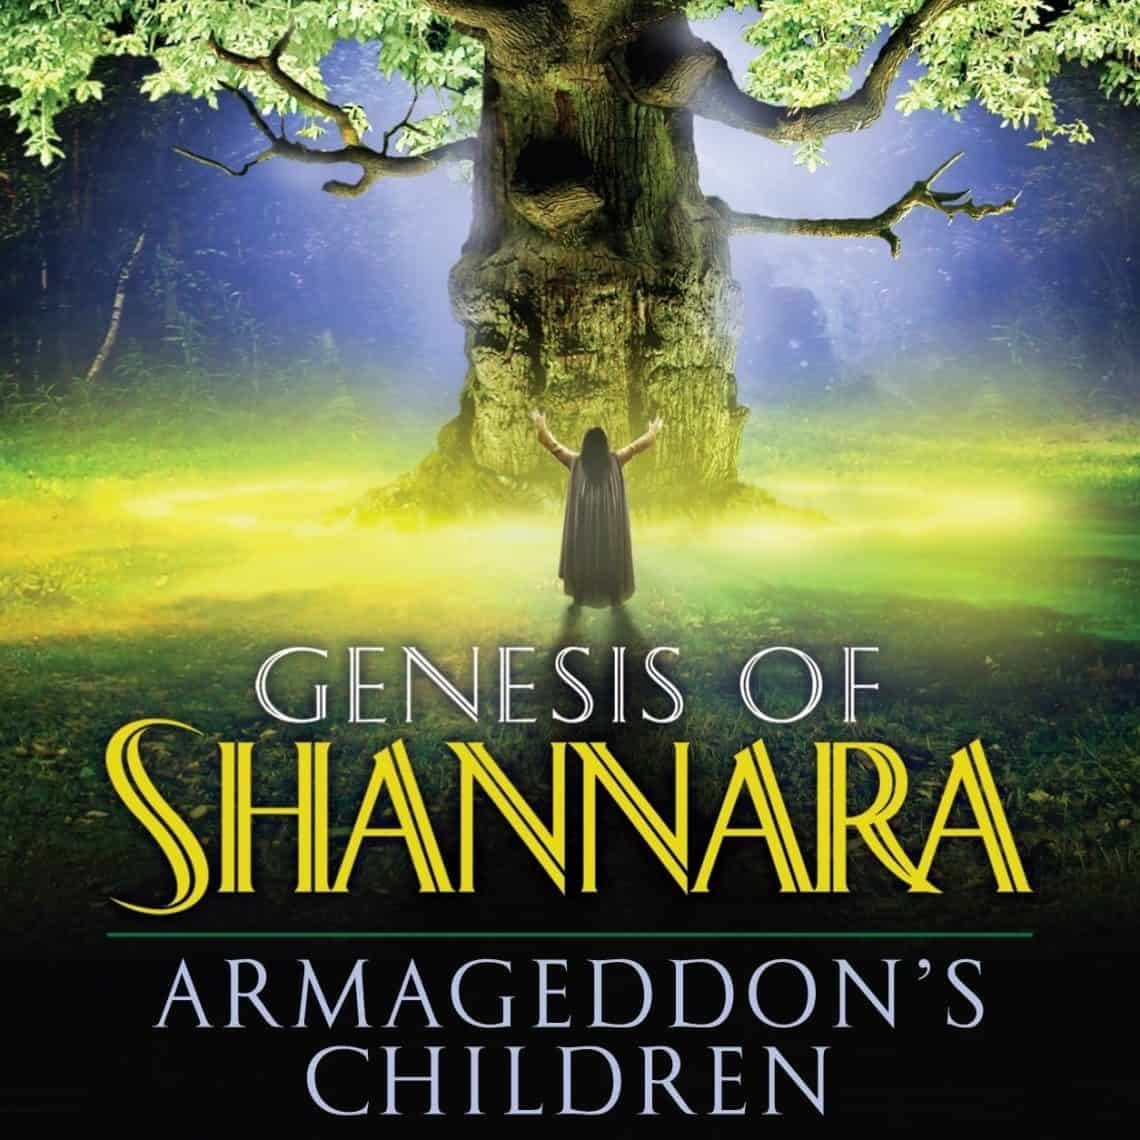 Armageddon's Children Audiobook Free Download and Listen